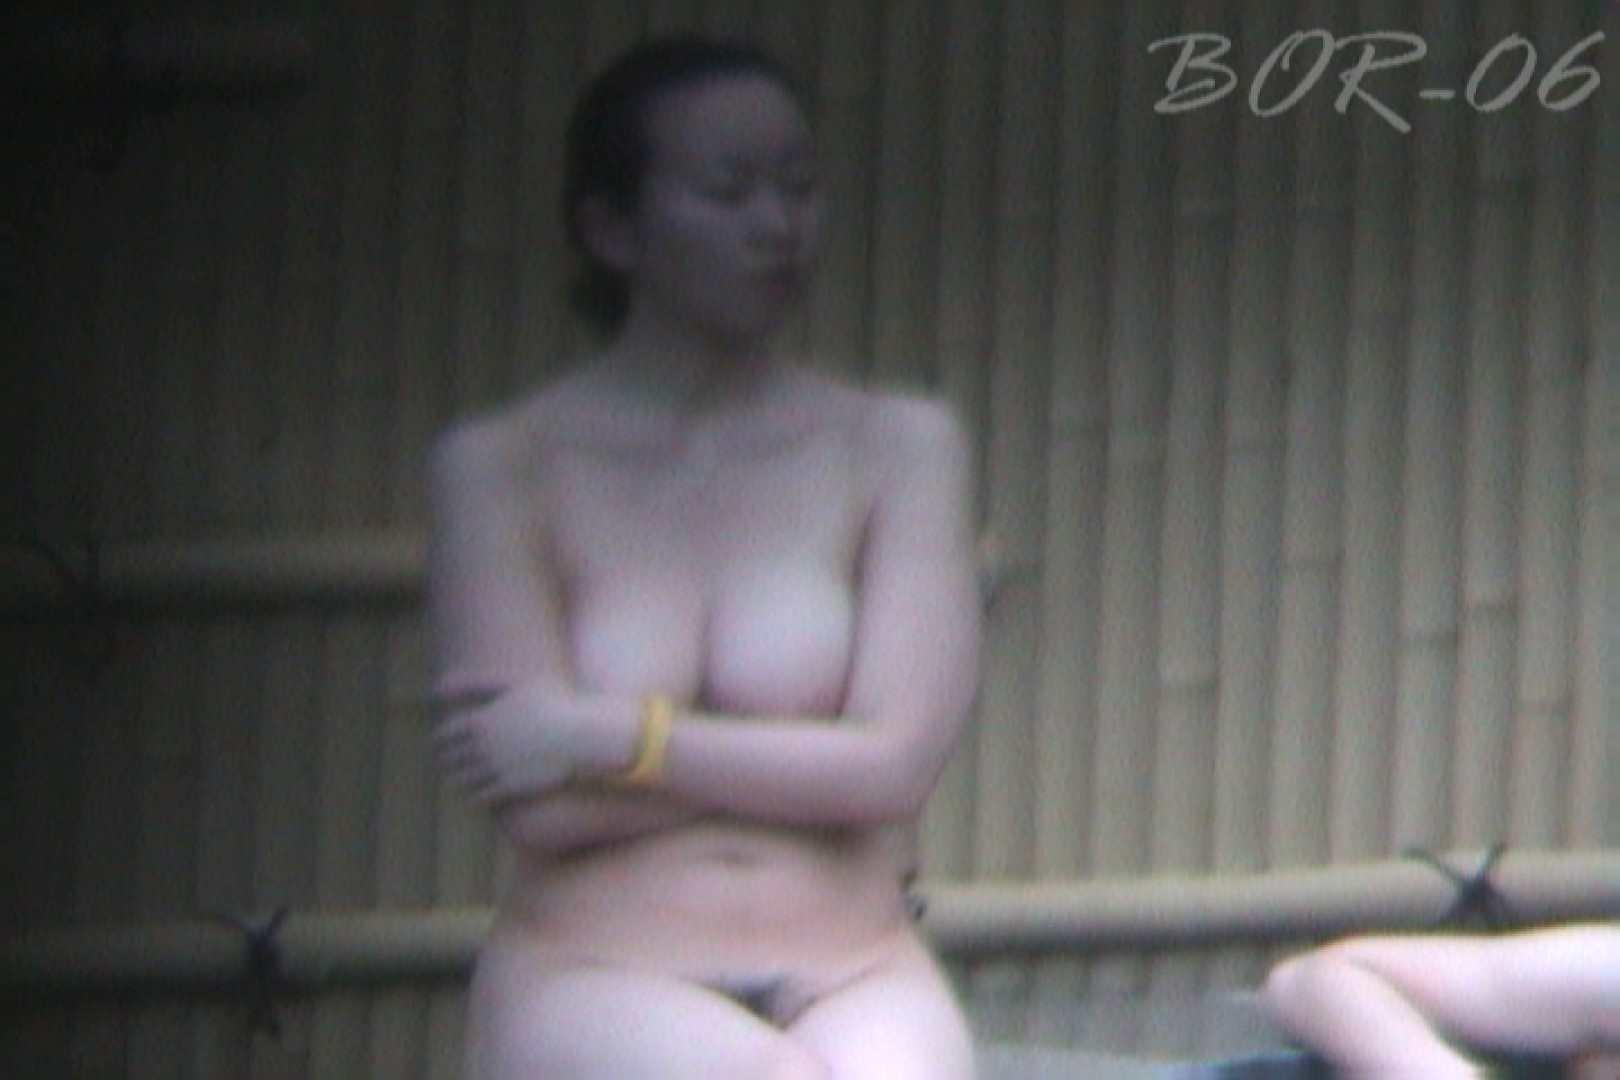 Aquaな露天風呂Vol.519 露天風呂突入 のぞき動画画像 102pic 71